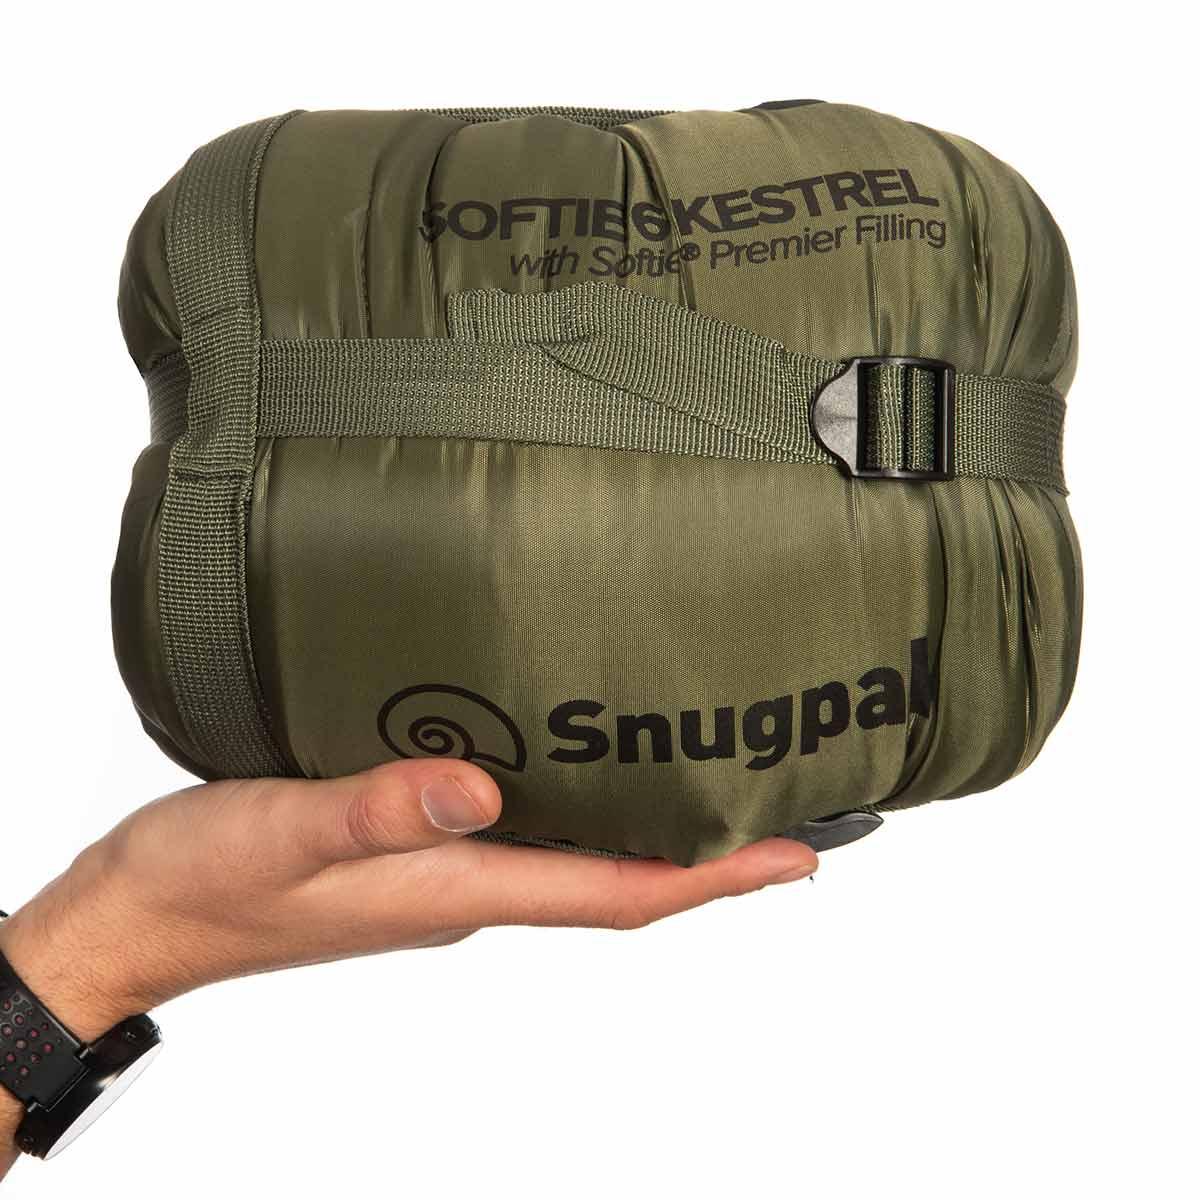 Snugpak Softie 6 Kestrel Military Army Sleeping Bag Compact Adult Travel Mummy